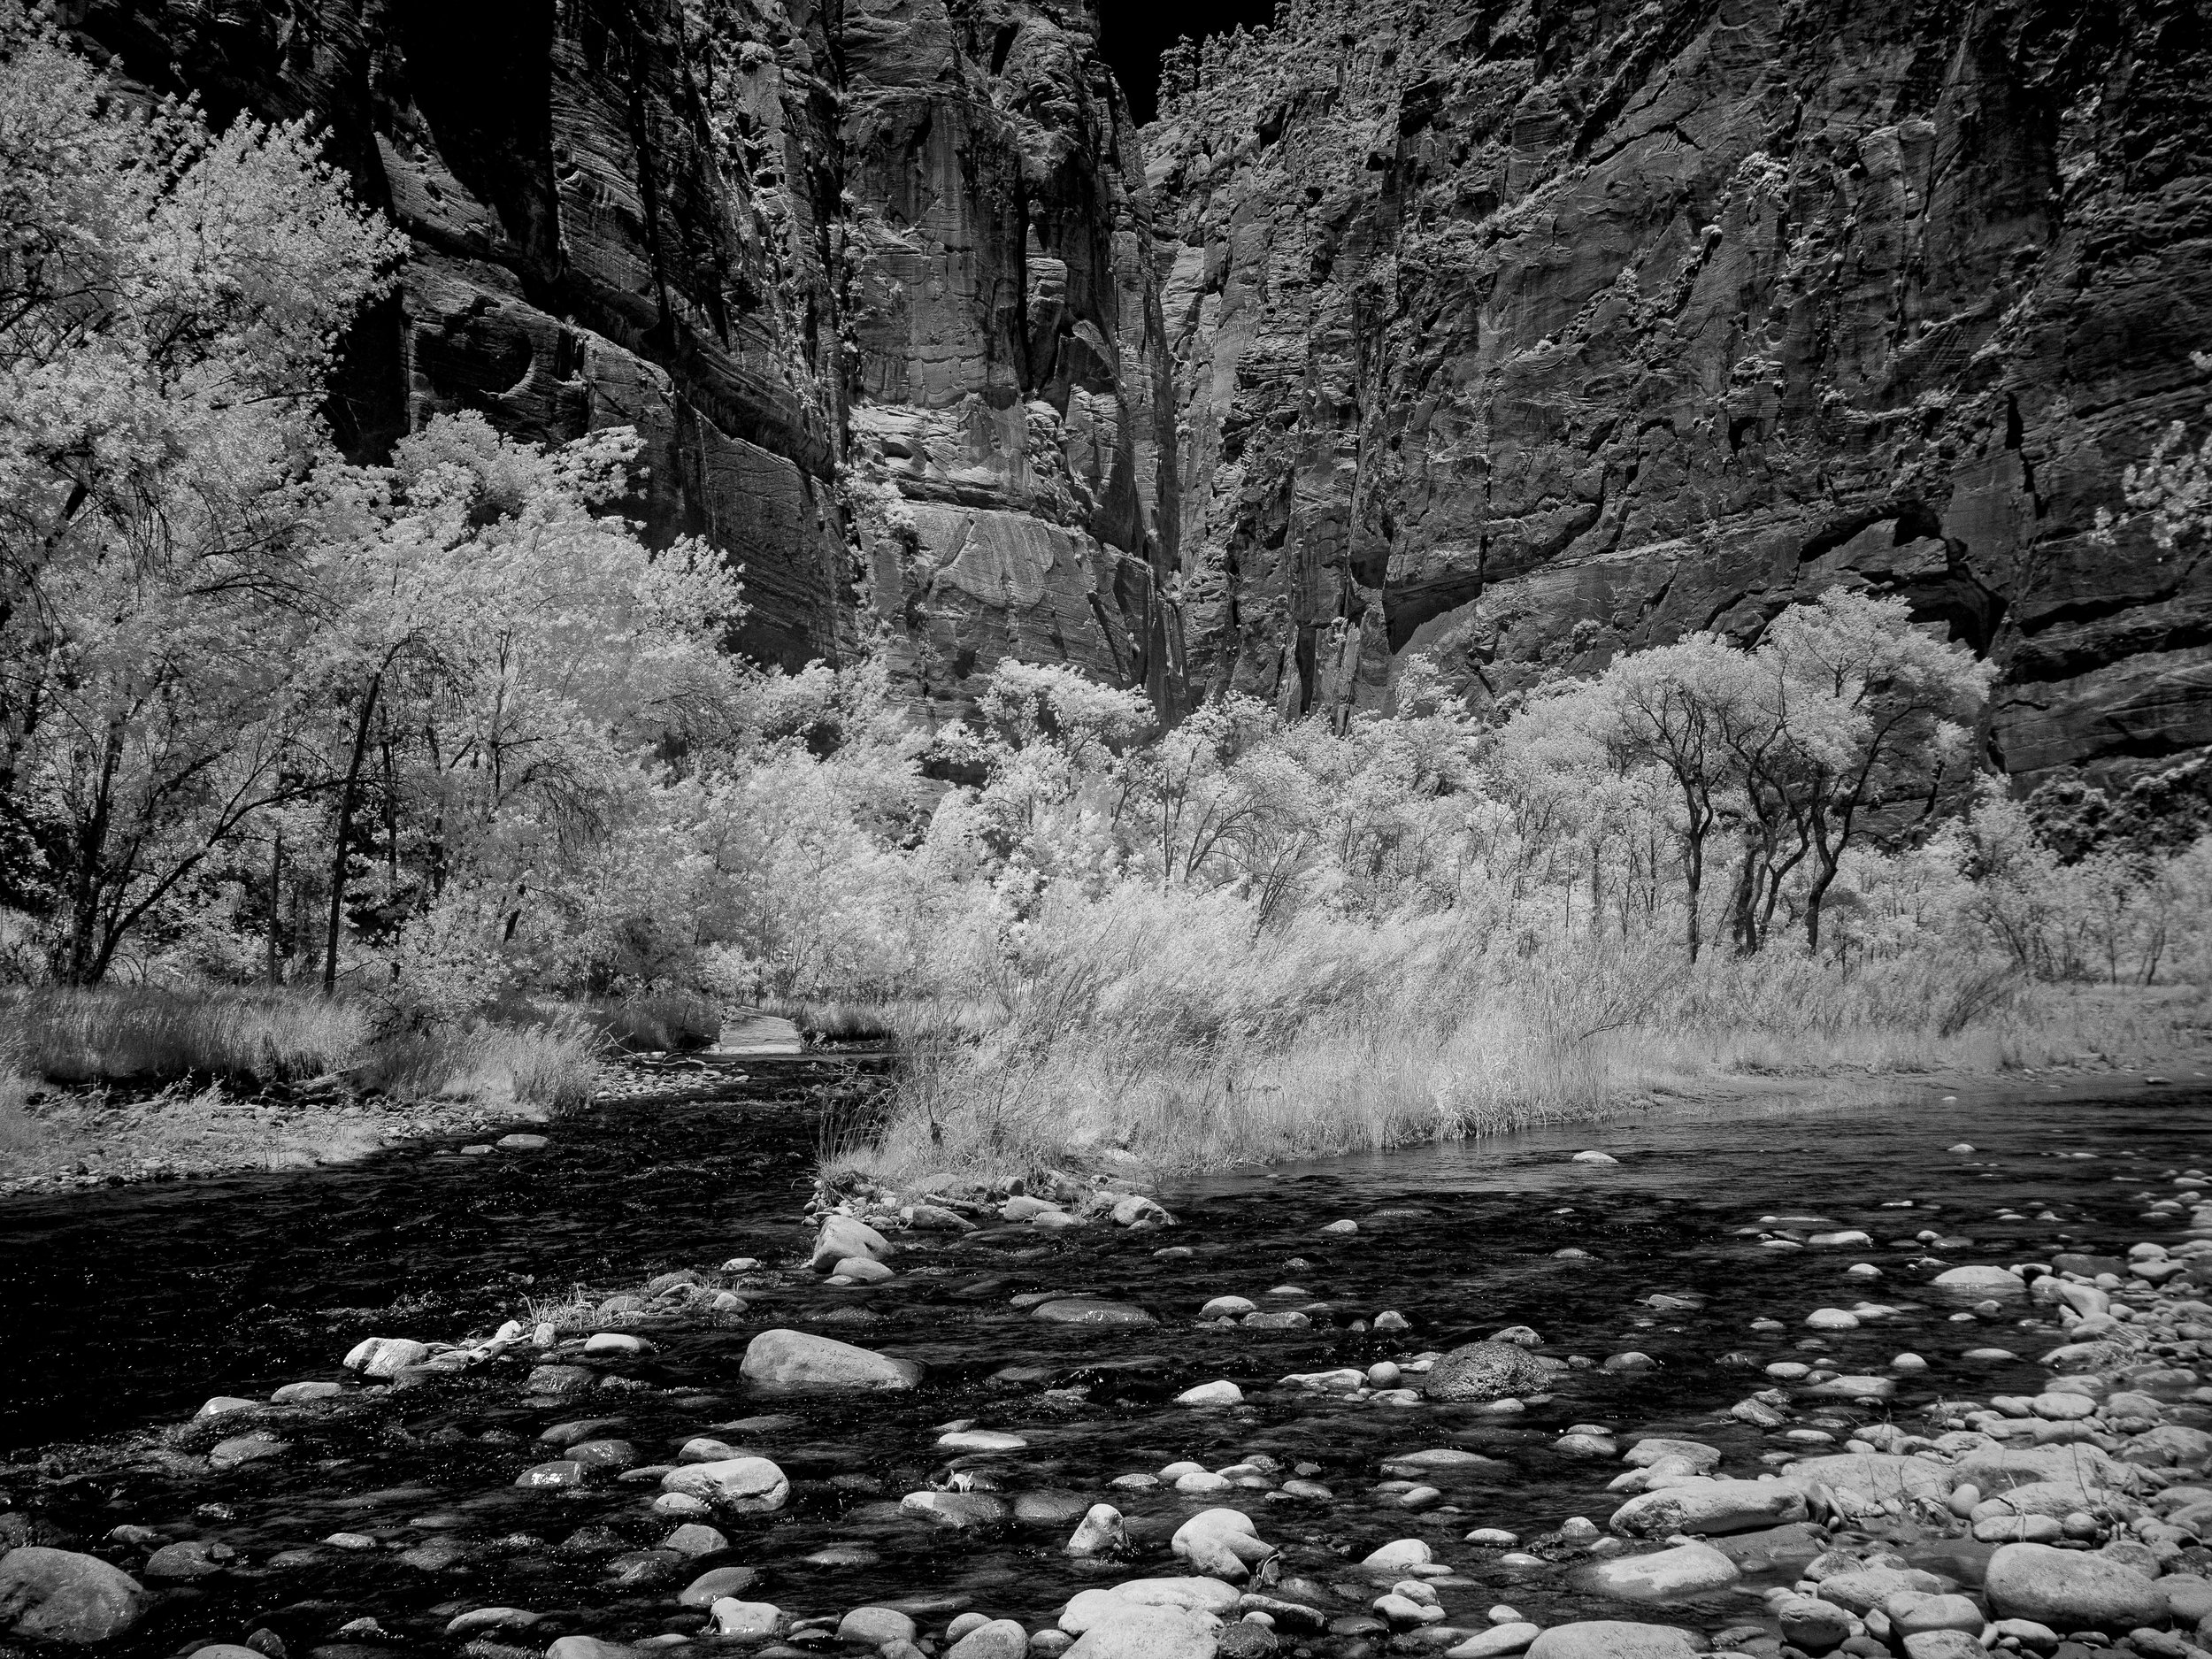 P1010051PS__PSD Glossy Sharpened_A River Runs Through It.jpg